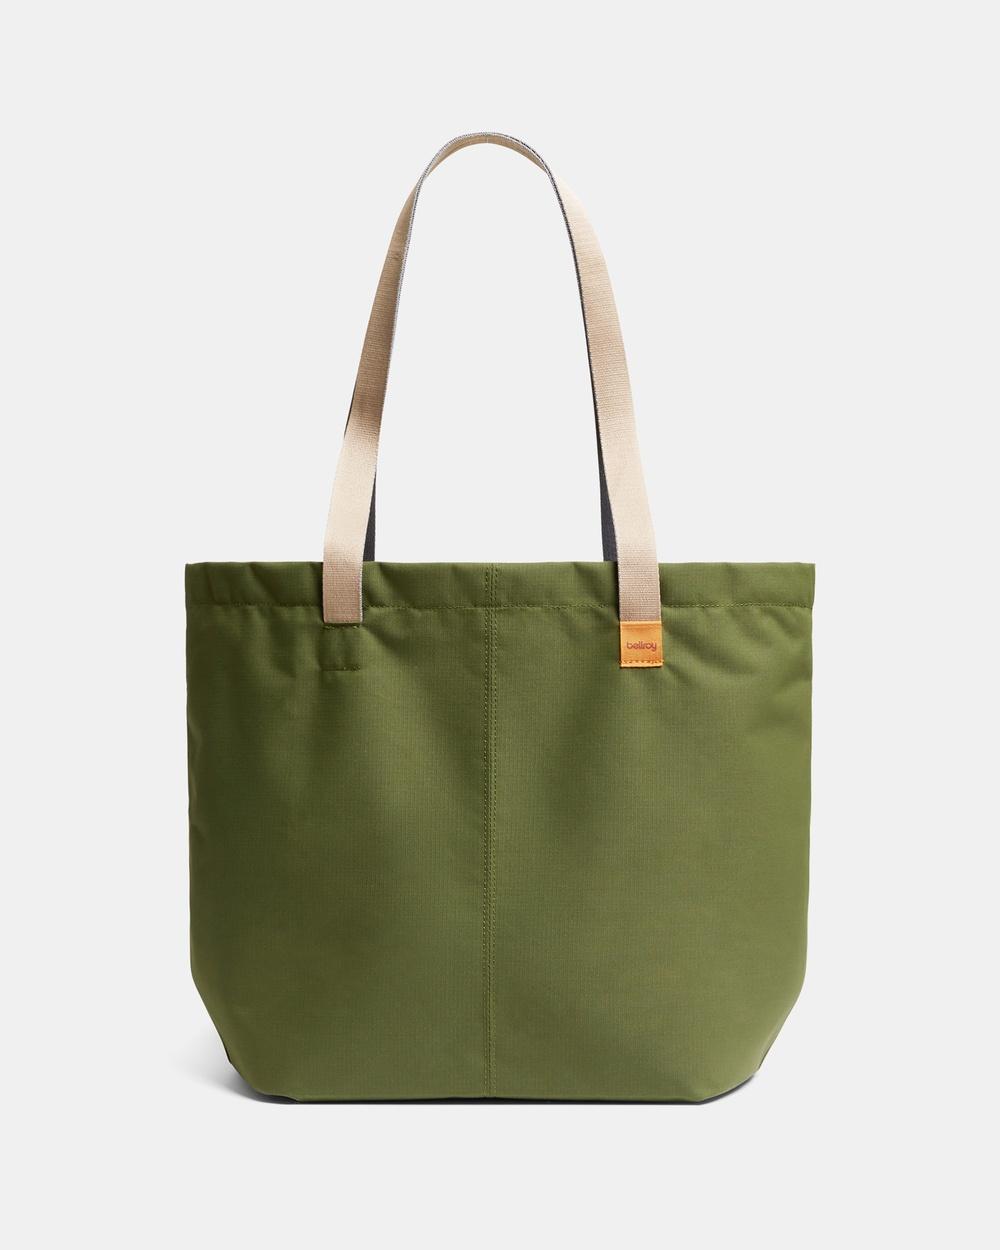 Bellroy Market Tote Beach Bags green